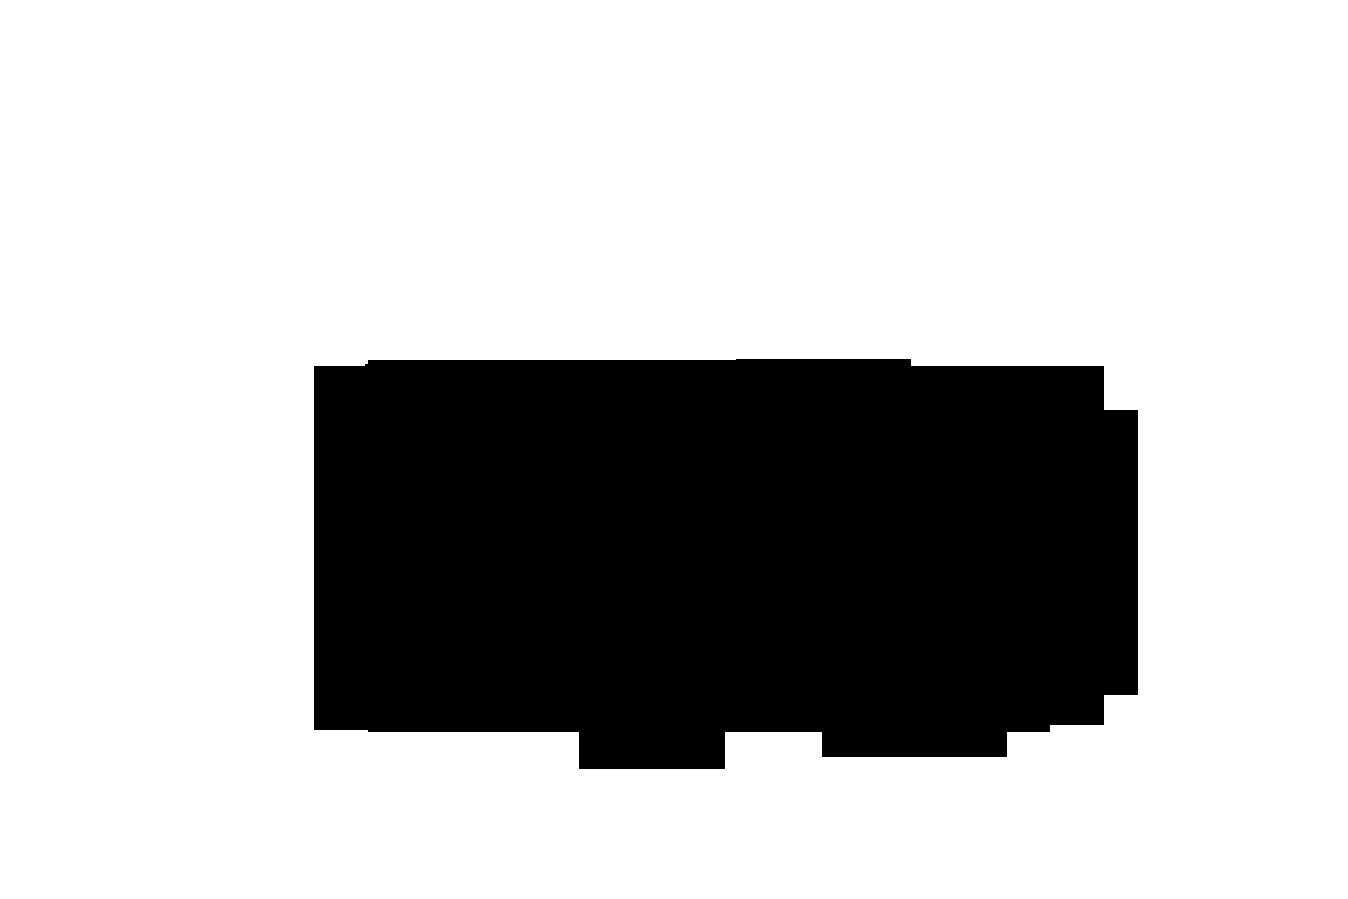 Bestellgrößen:09 = 430 cm Rechtseinzug; 10 = 430 cm Linkseinzug